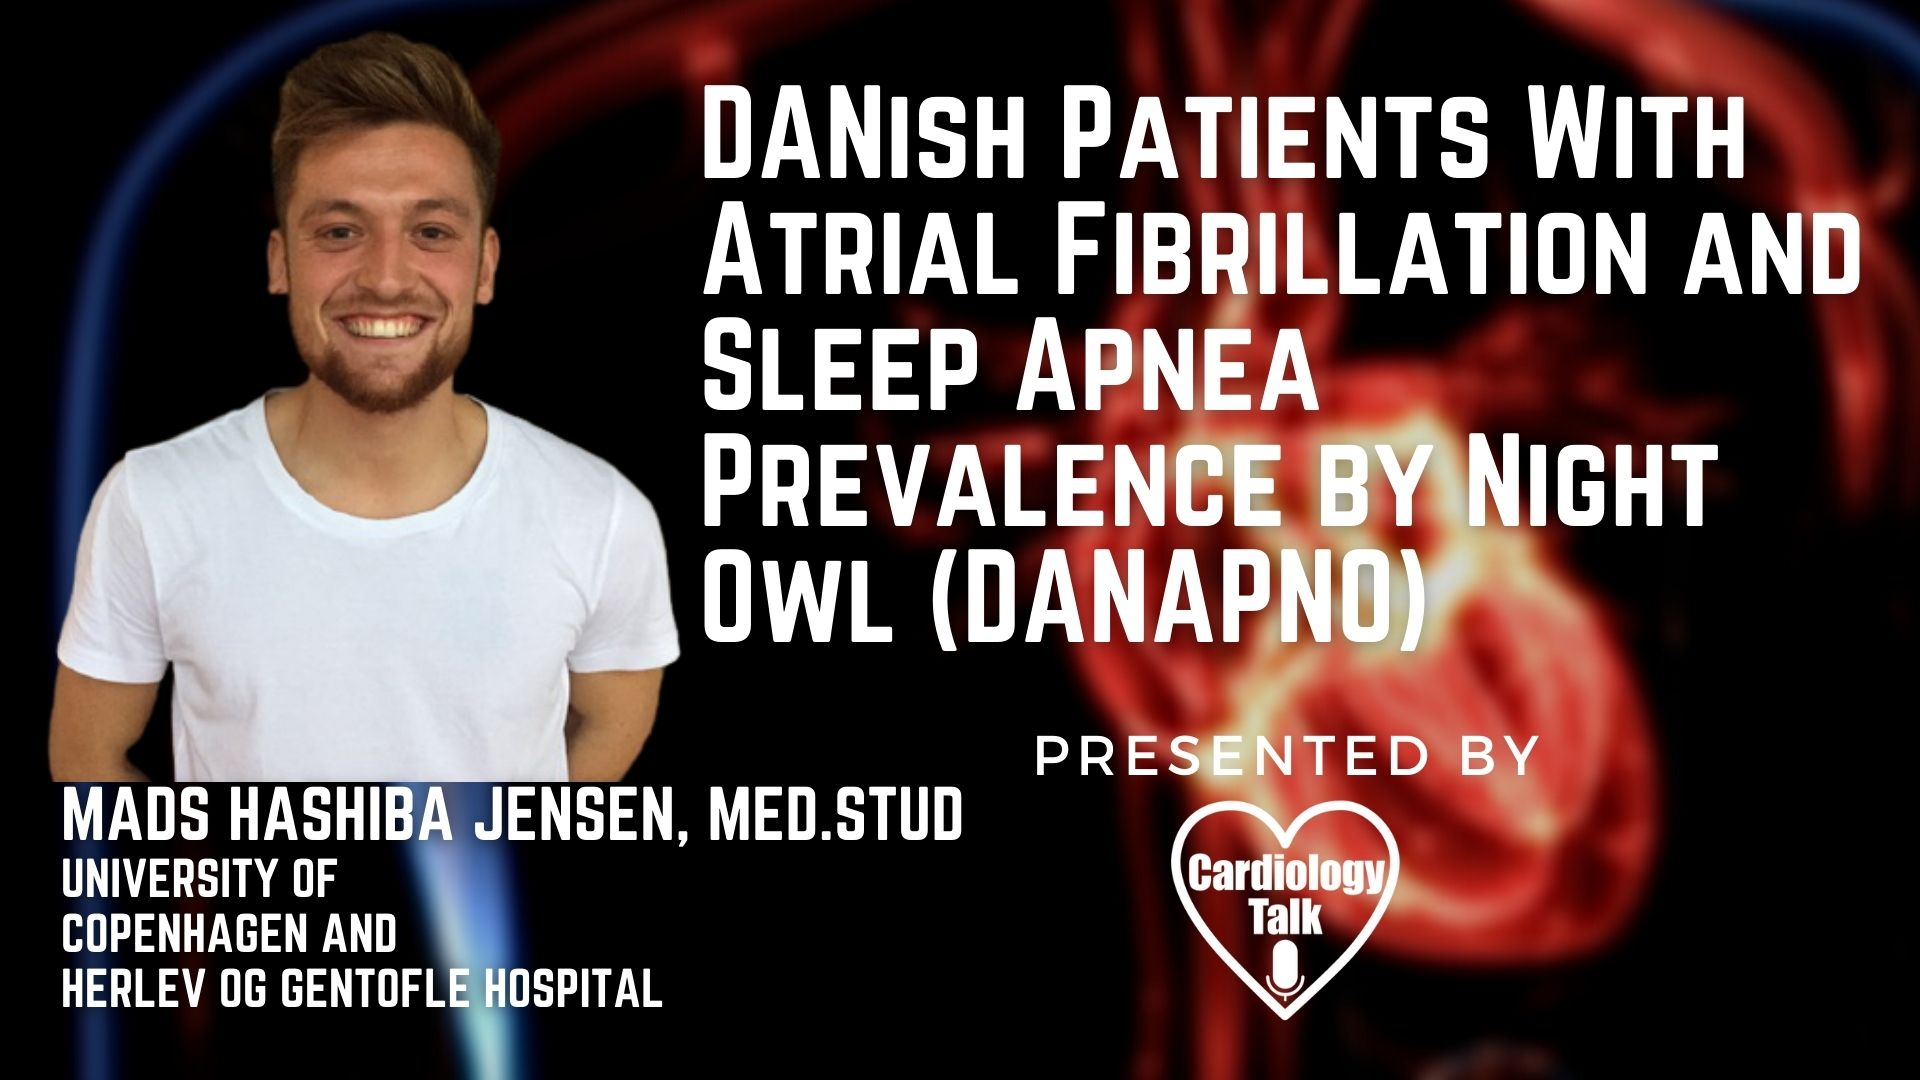 Mads Hashiba Jensen, med.stud @MadsHashiba @uni-copenhagen @UCPH_Health @koebenhavns_uni #Atrial Fibrillation #SleepApnea #DANAPNO #Cardiology #Research DANish Patients With Atrial Fibril...